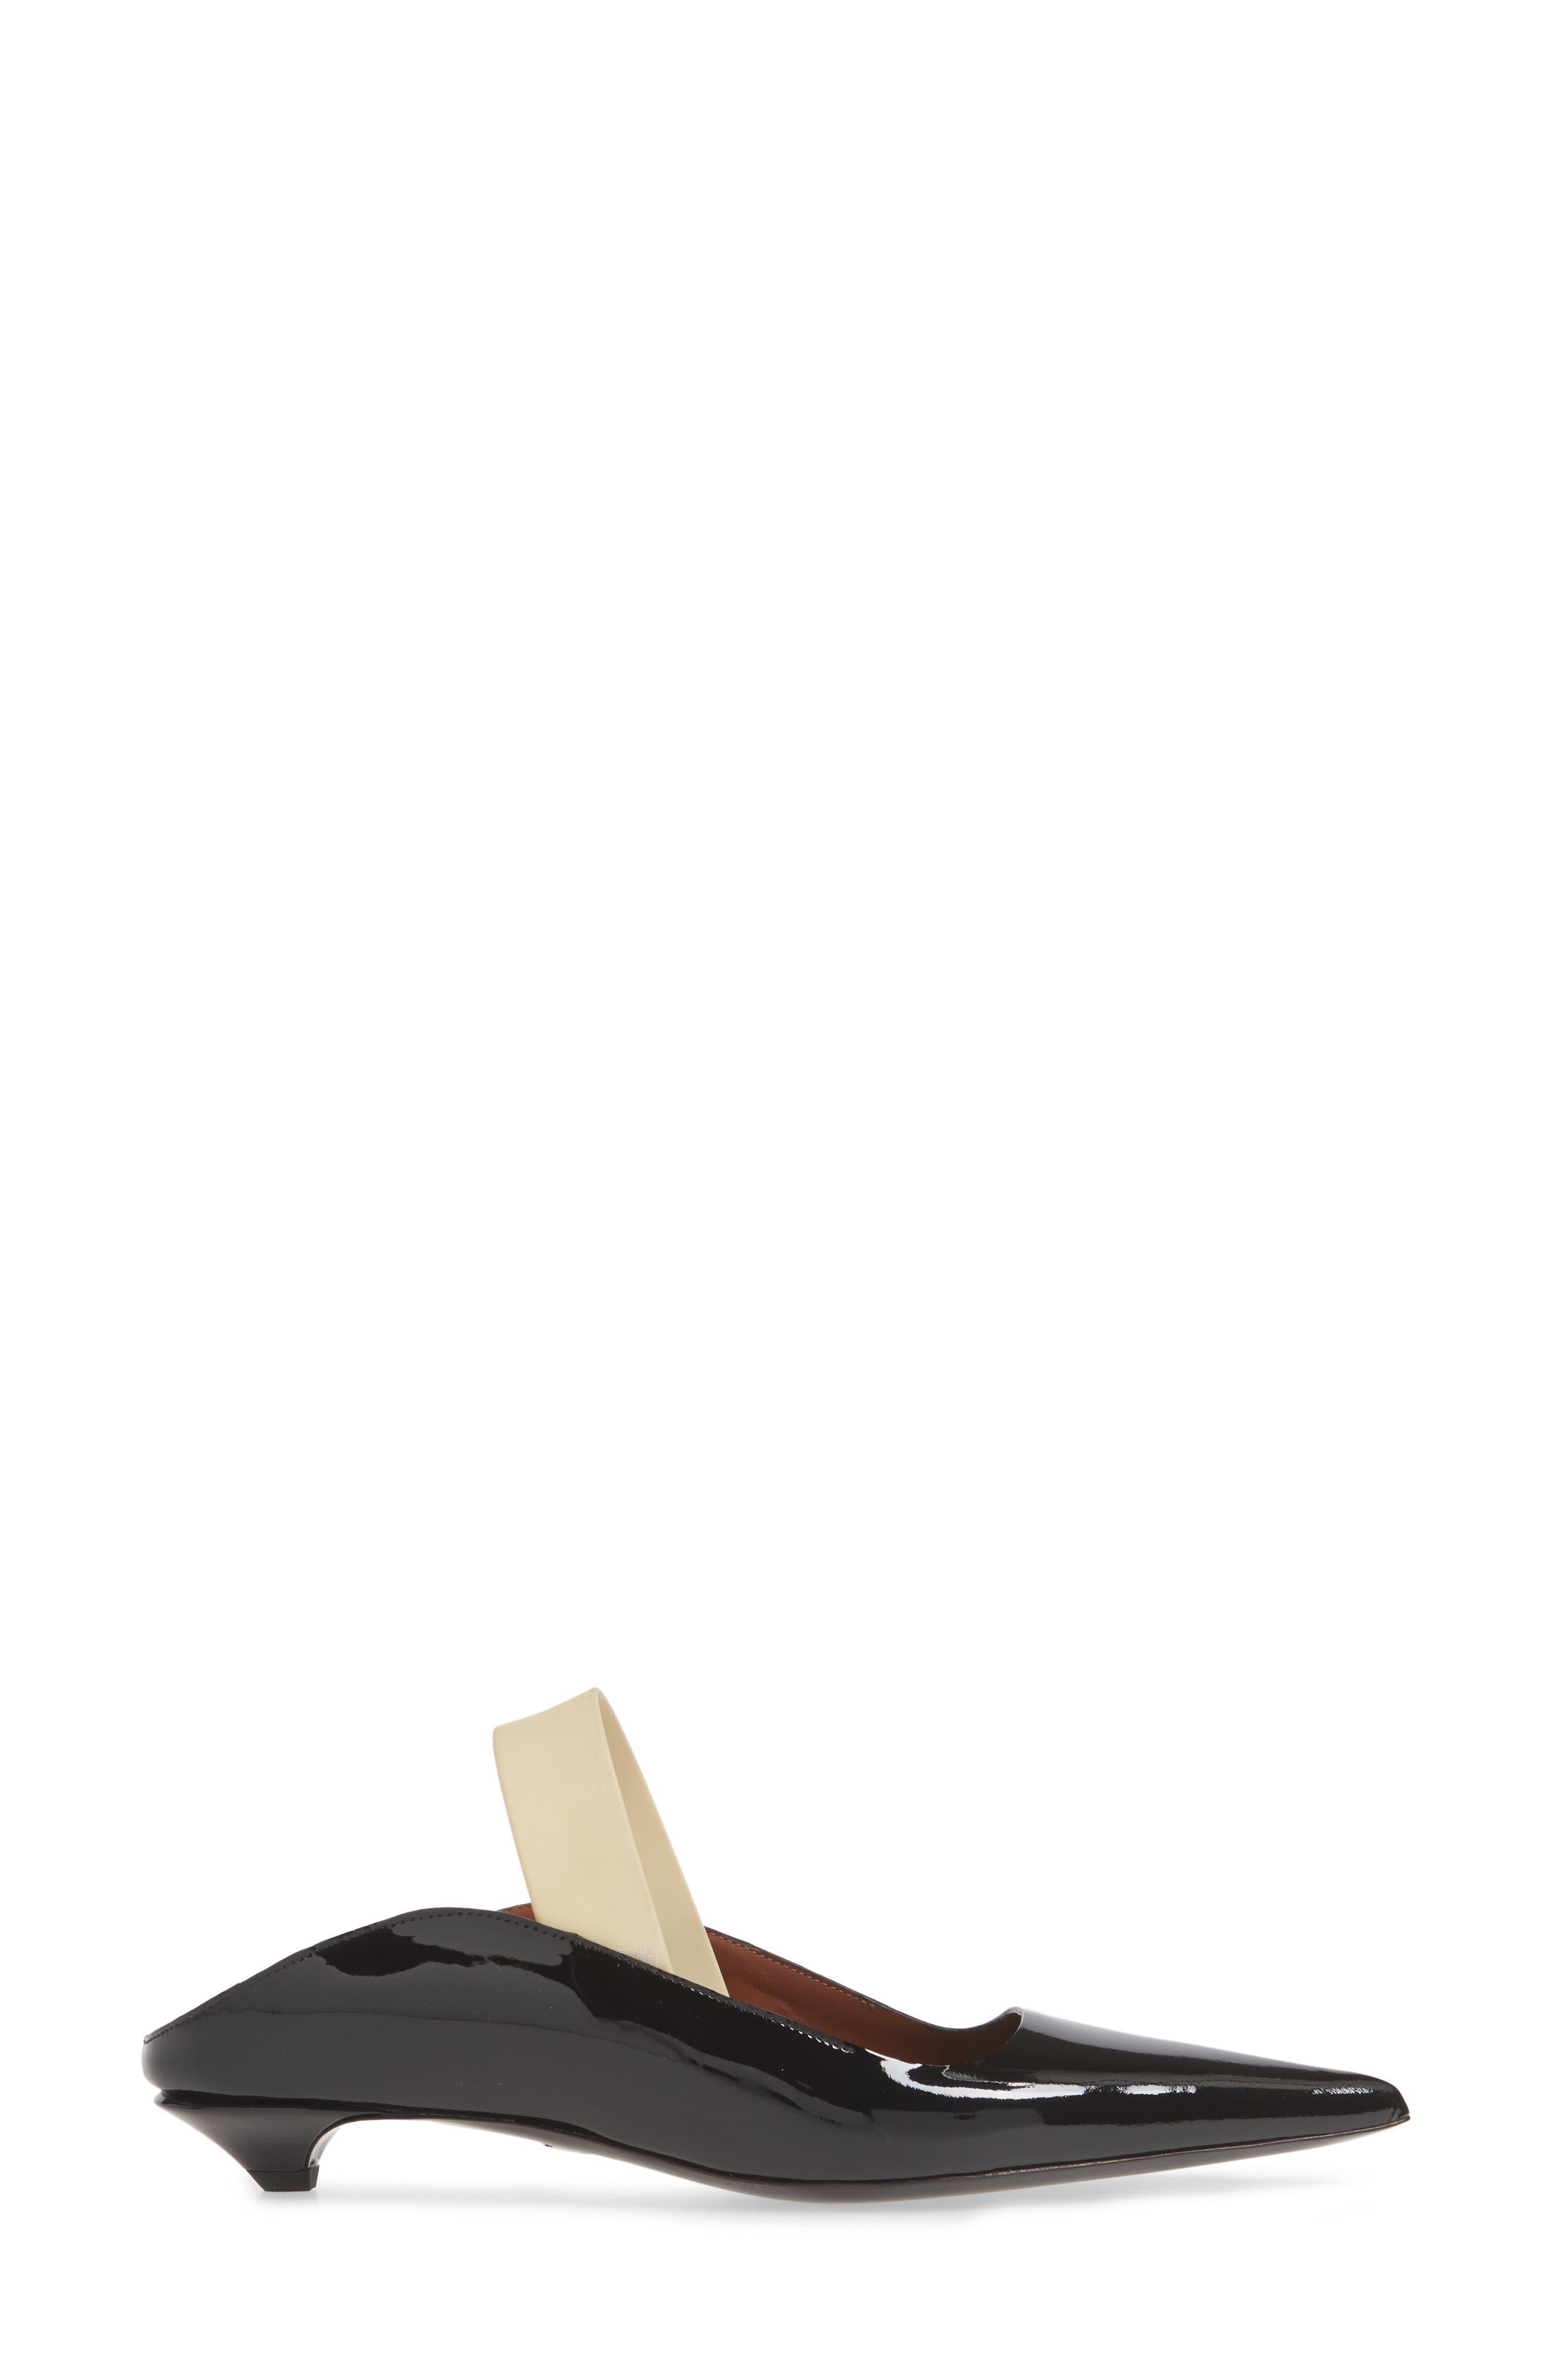 PROENZA SCHOULER, Wave Pointy Toe Pump, Alternate thumbnail 3, color, BLACK